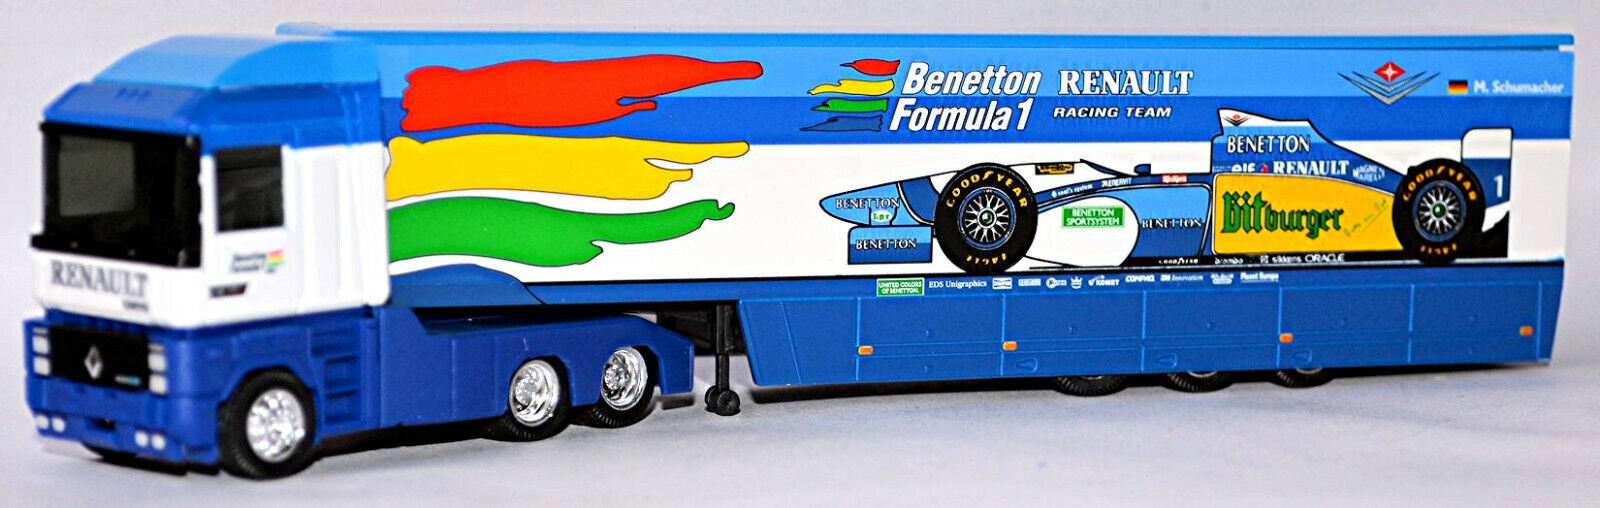 Renault Ae 500 Magnum Maleta-Sz Benetton Formula1 Bitburger 1 87 Albedo 220001